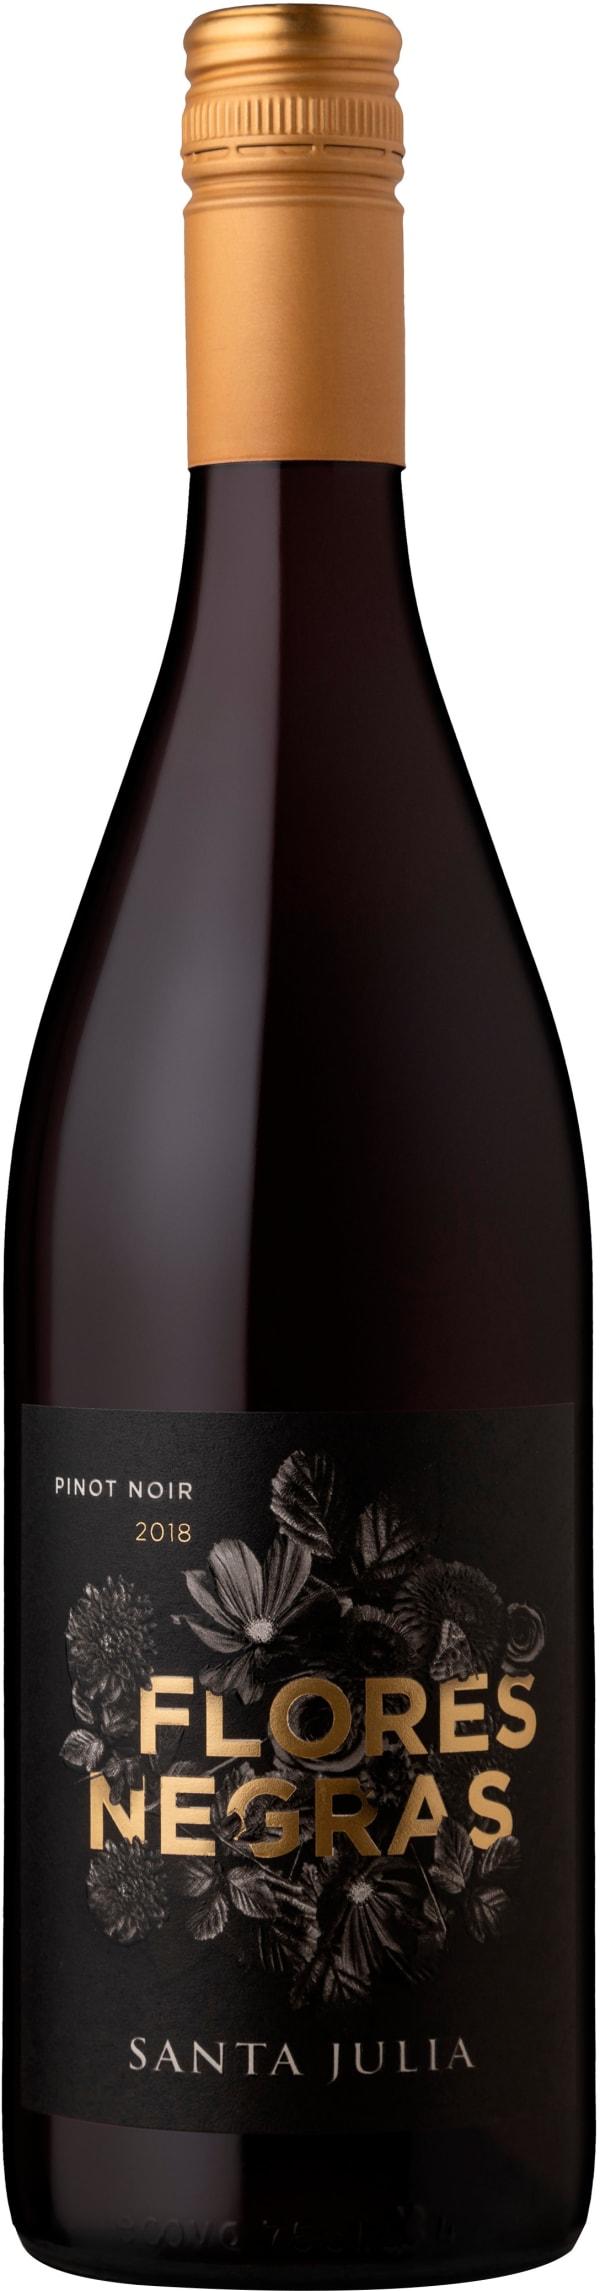 Santa Julia Pinot Noir Flores Negras 2019